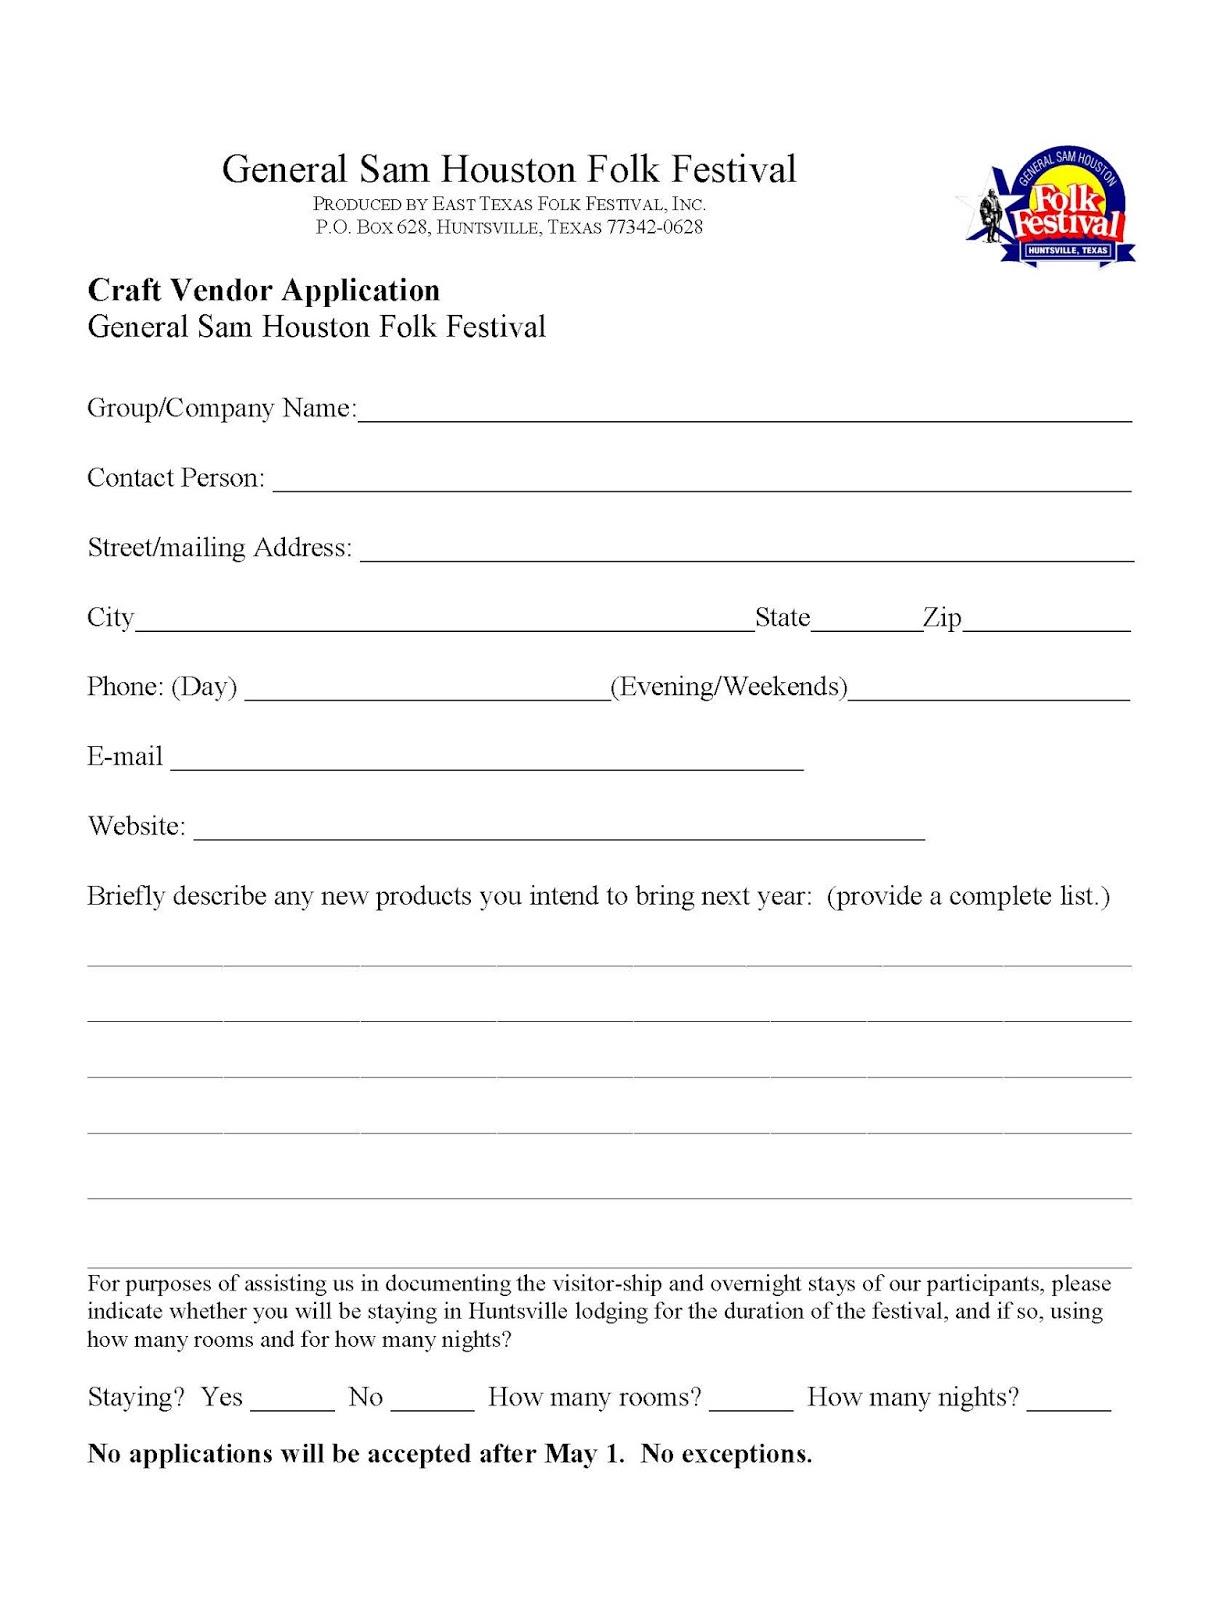 General Sam Houston Folk Festival: Craft Vendor Application